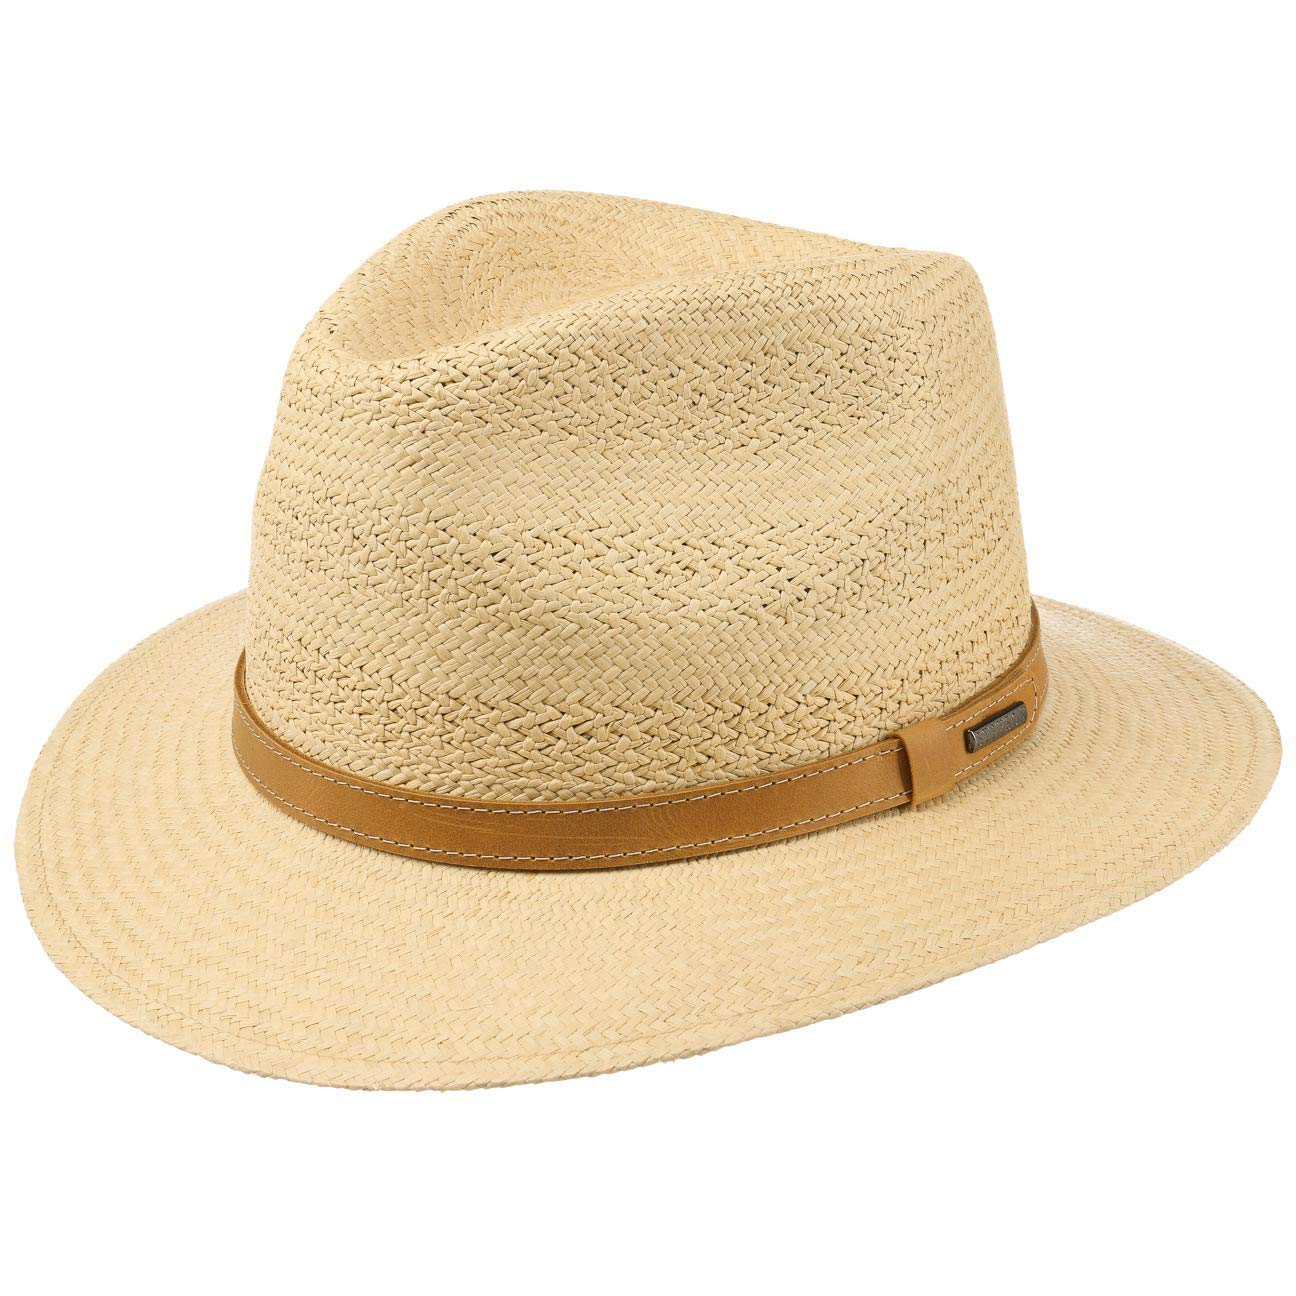 c21624e86b3 Stetson Lexerell Traveller Panama Hat Sun Beach (M (56-57 cm) - Nature)   Amazon.co.uk  Clothing